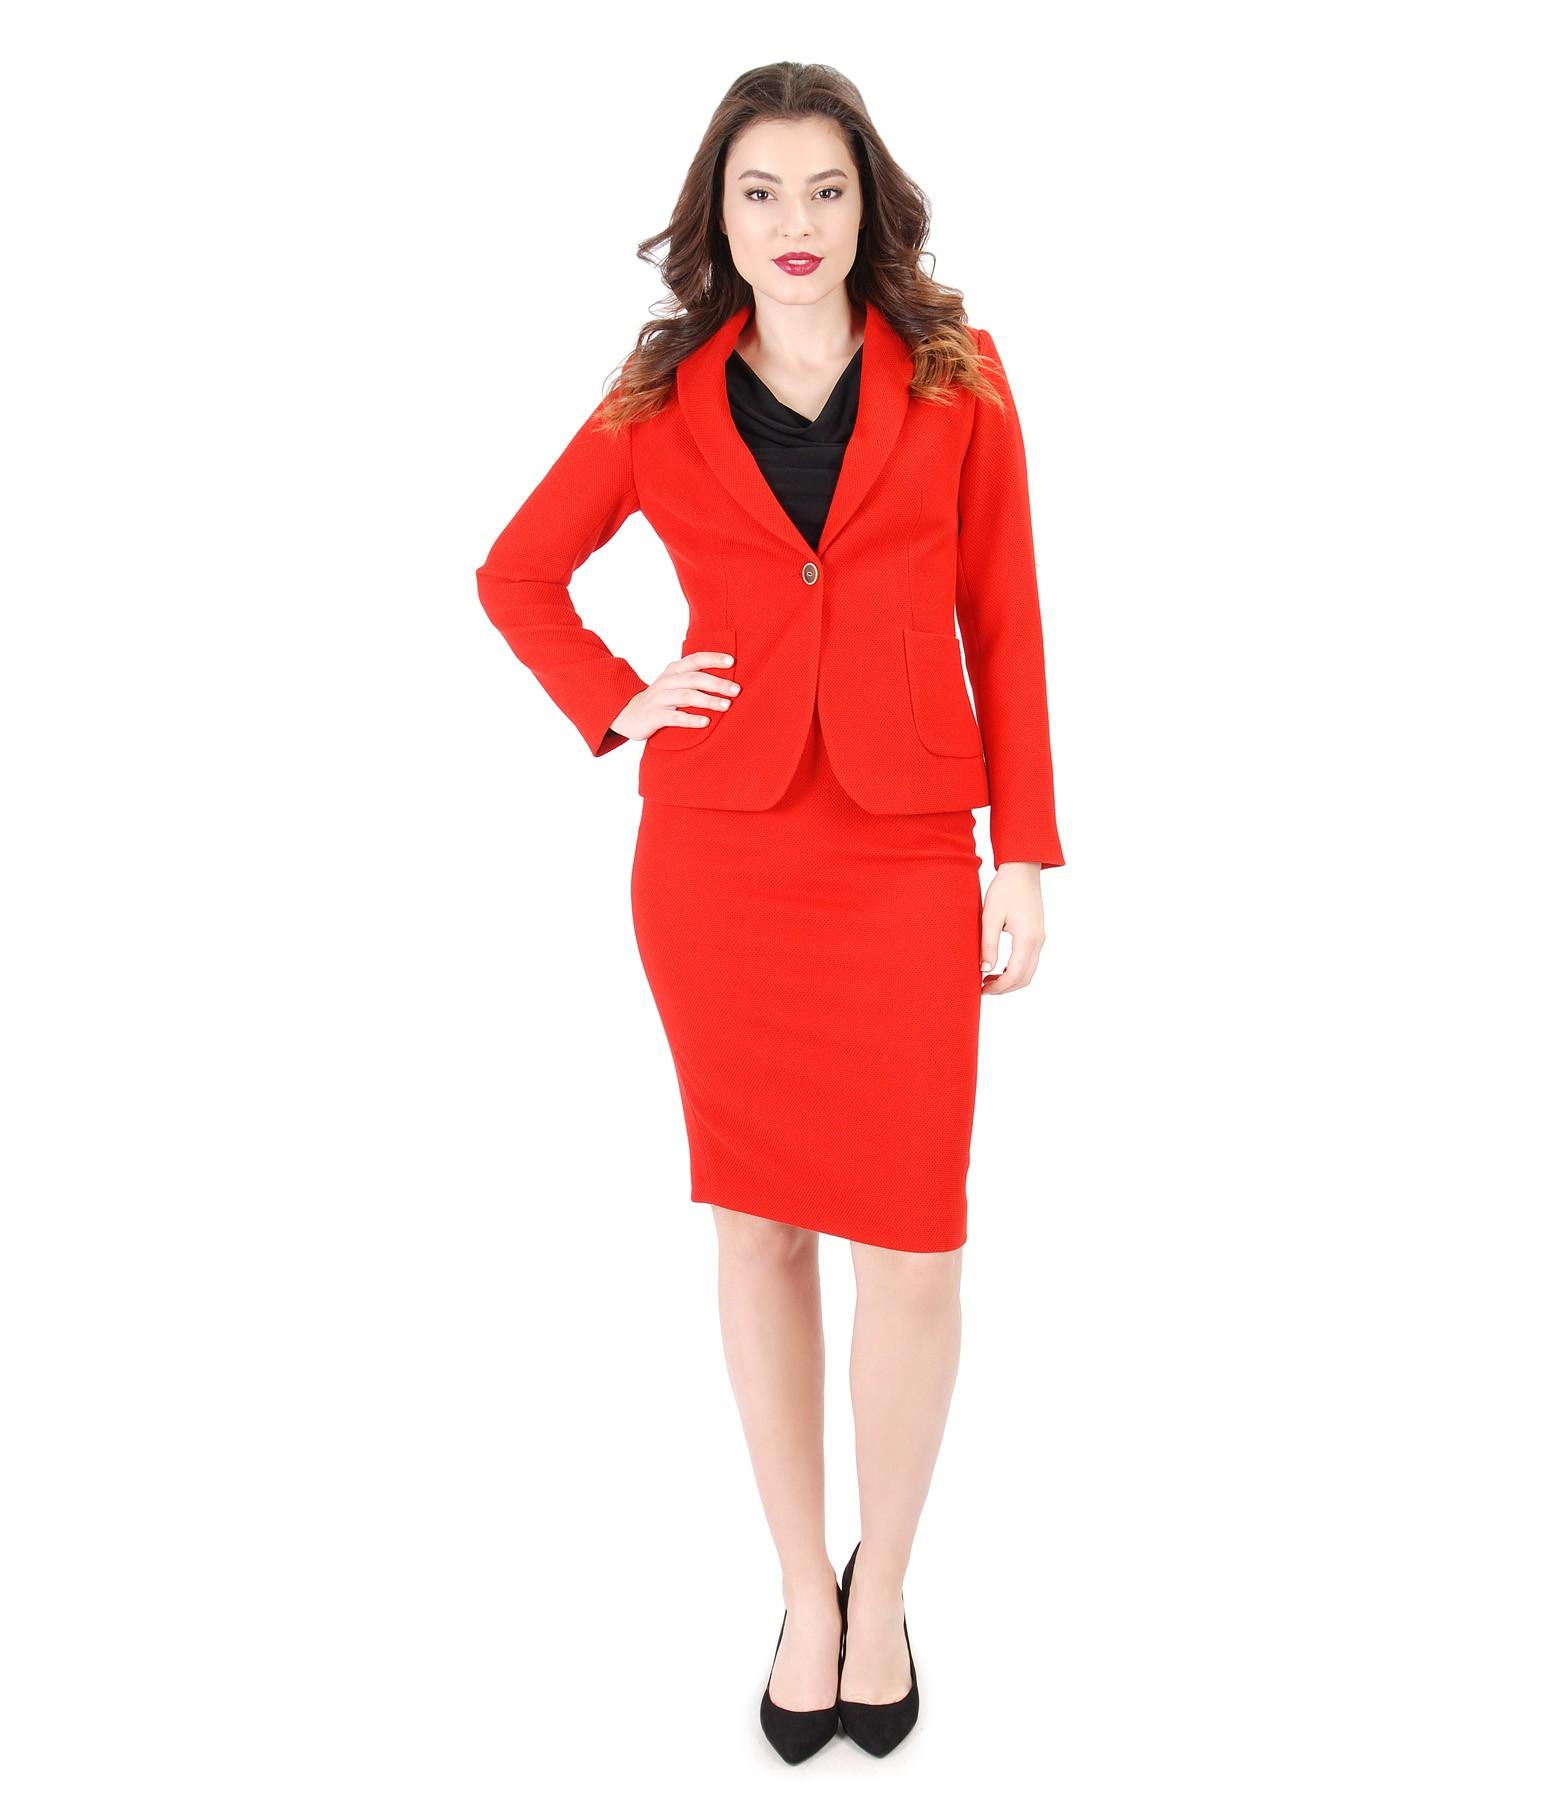 Women Office Suit With Jacket And Elastic Fabric Skirt Yokko